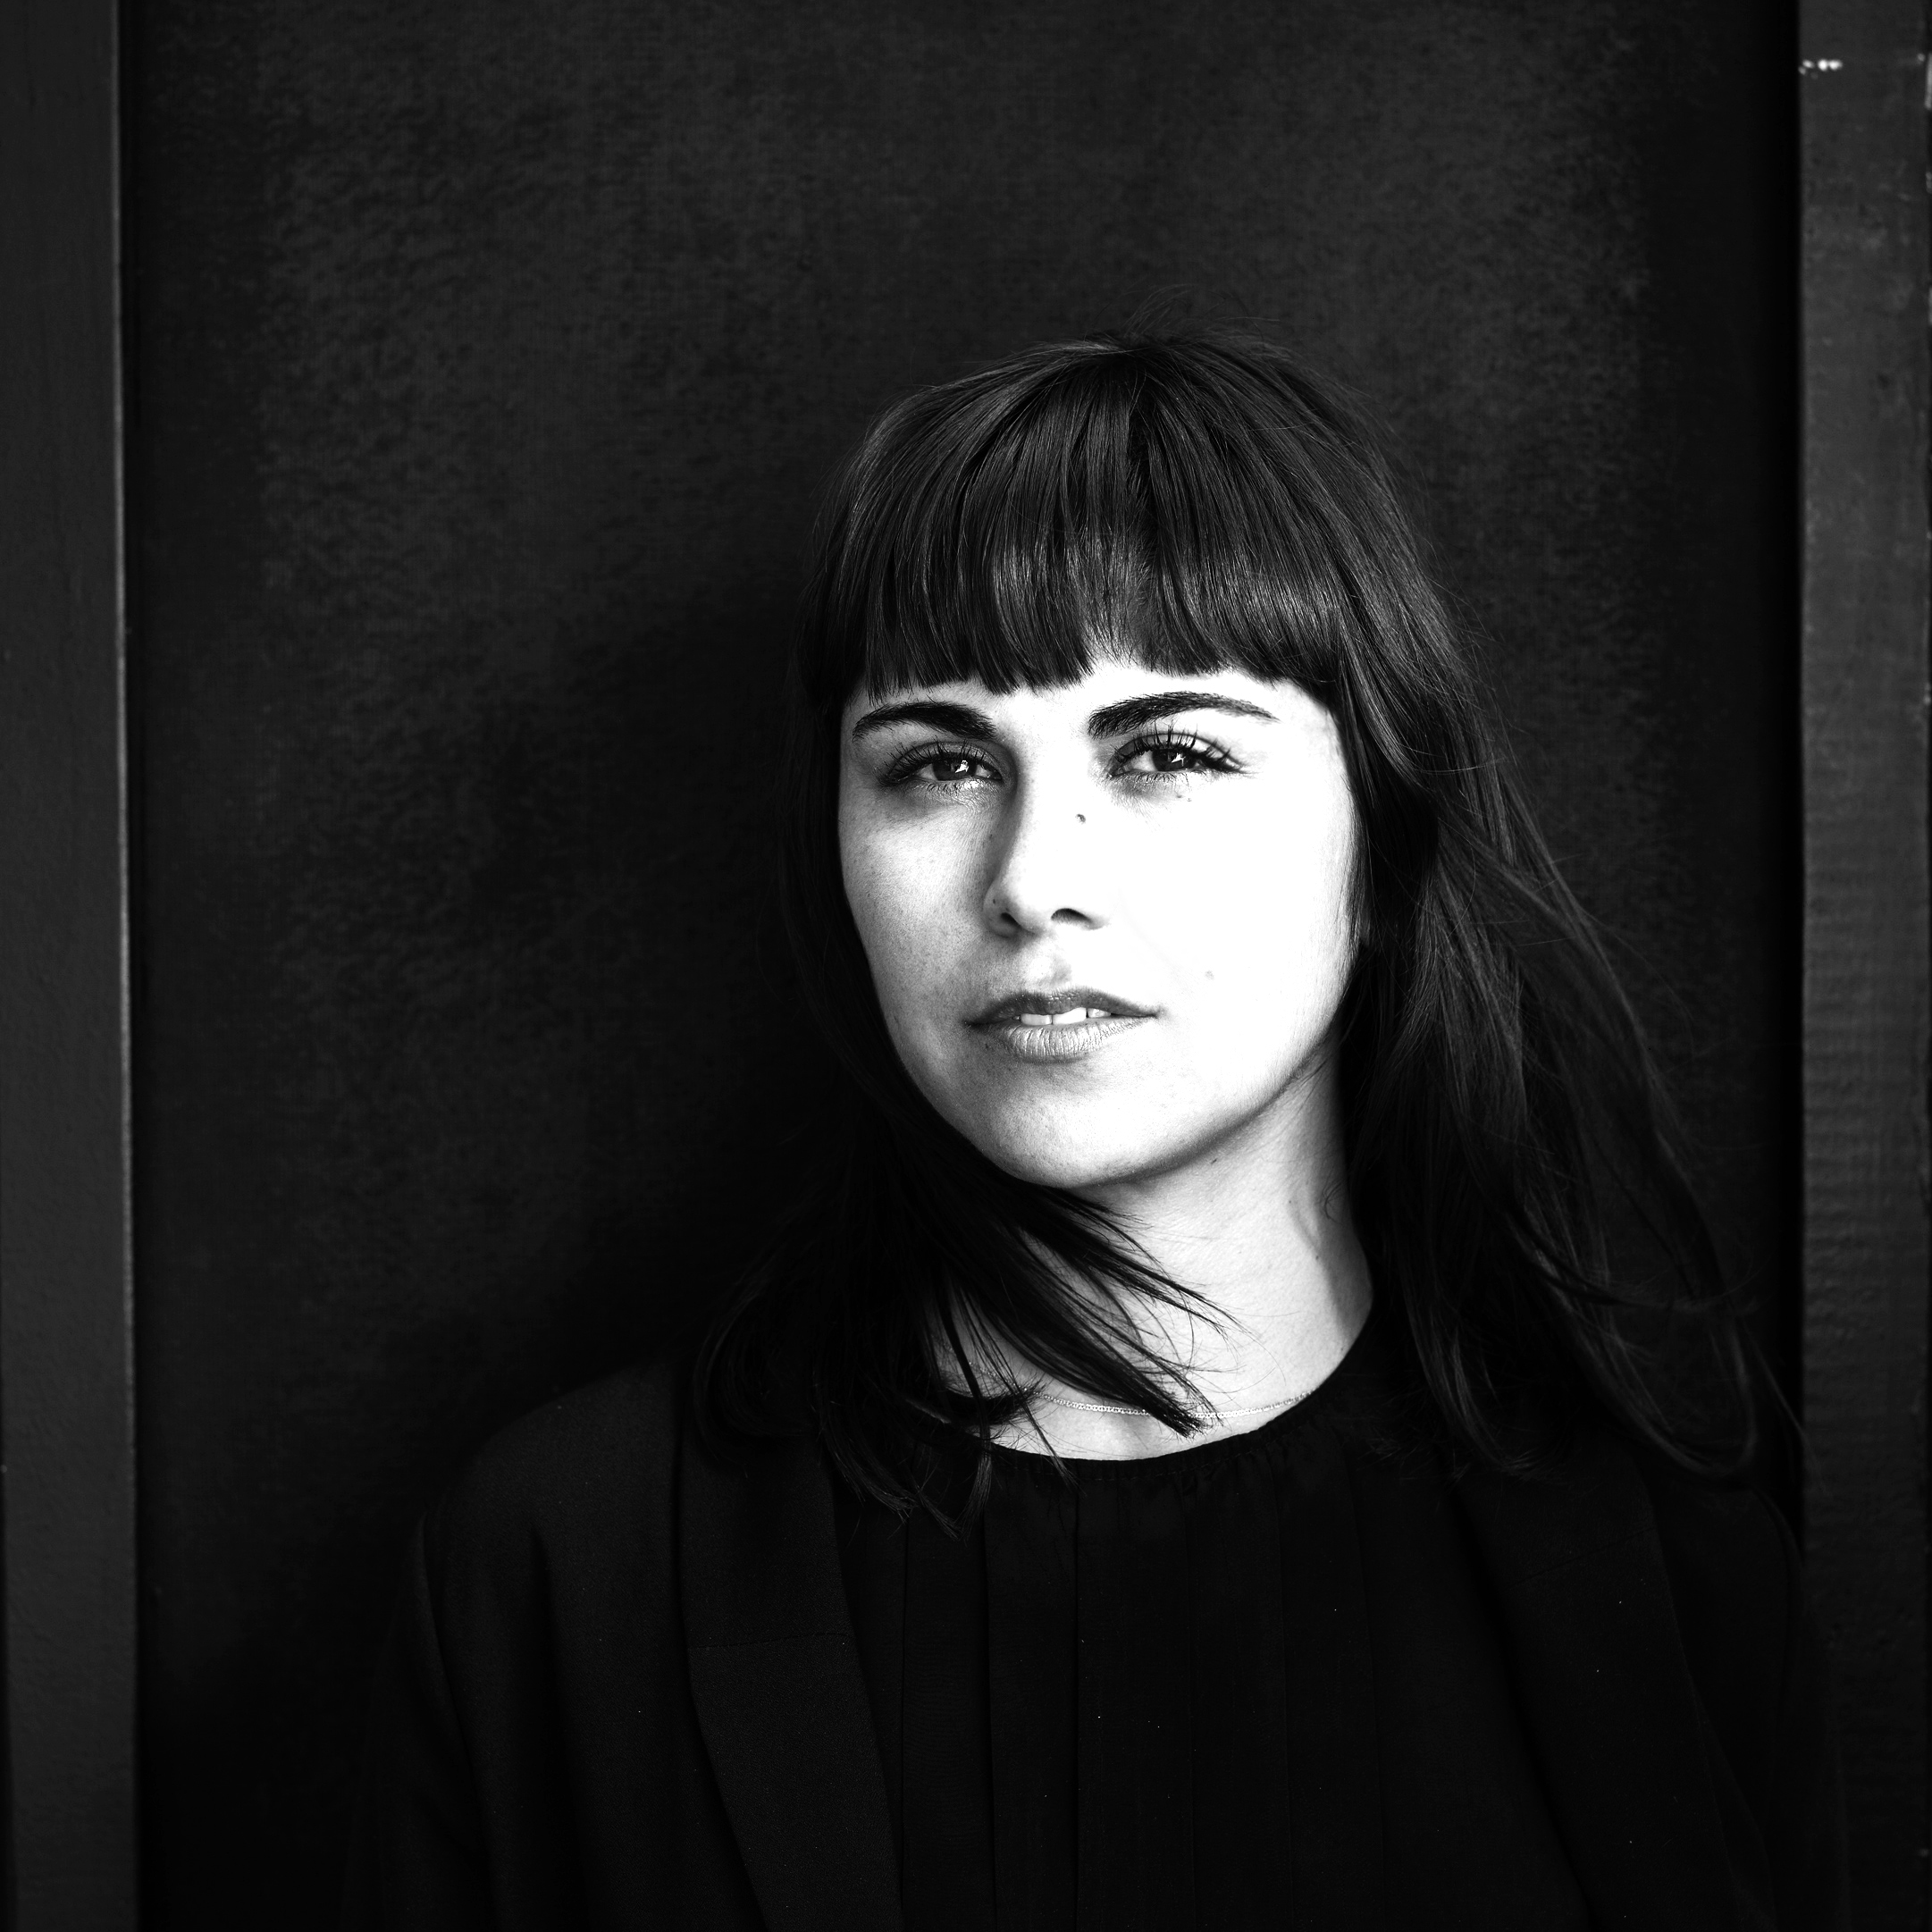 Portrait by  Lindsten-Nilsson